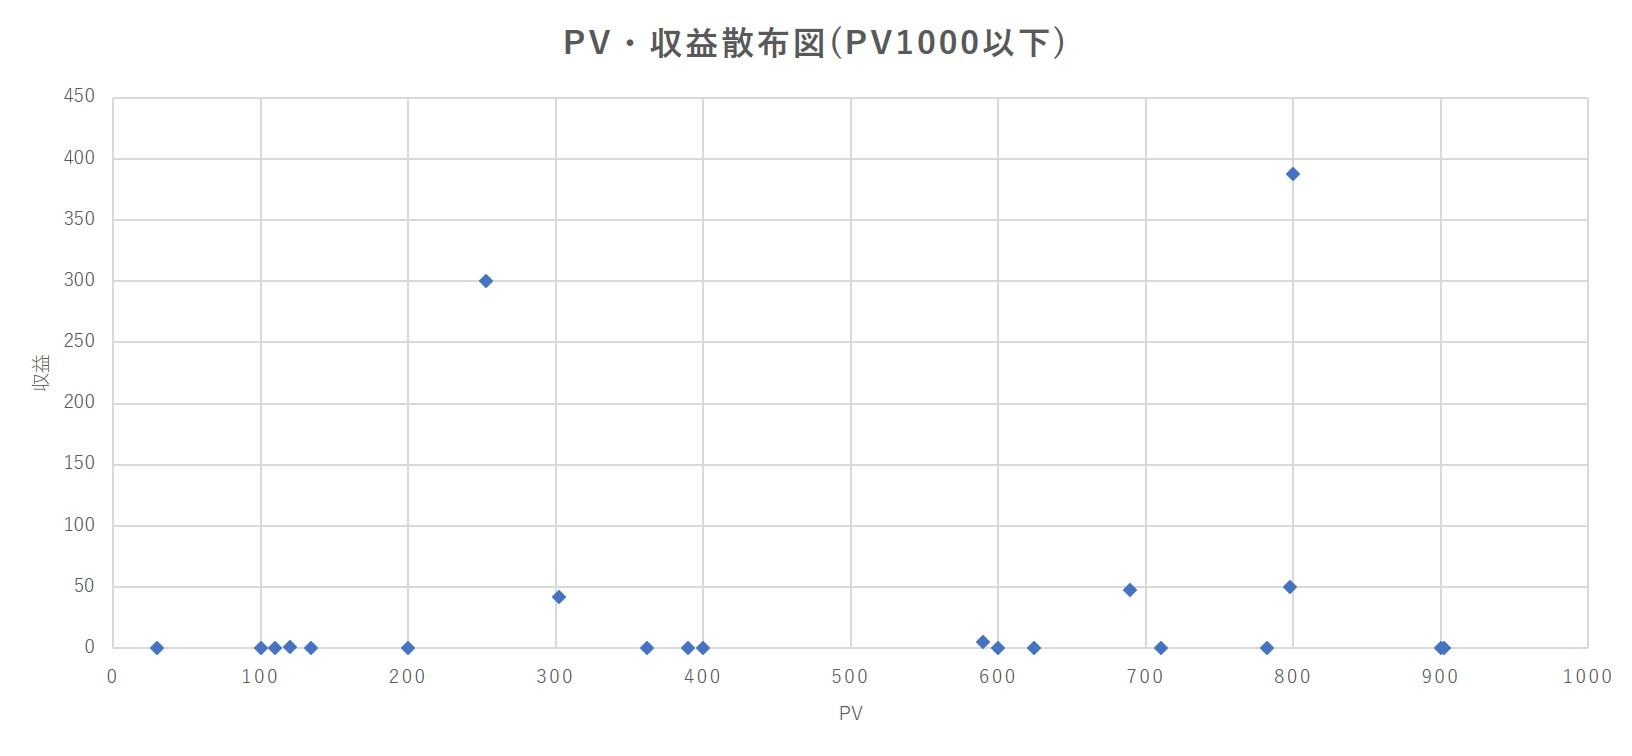 収益・PV散布図(PV1000以下)